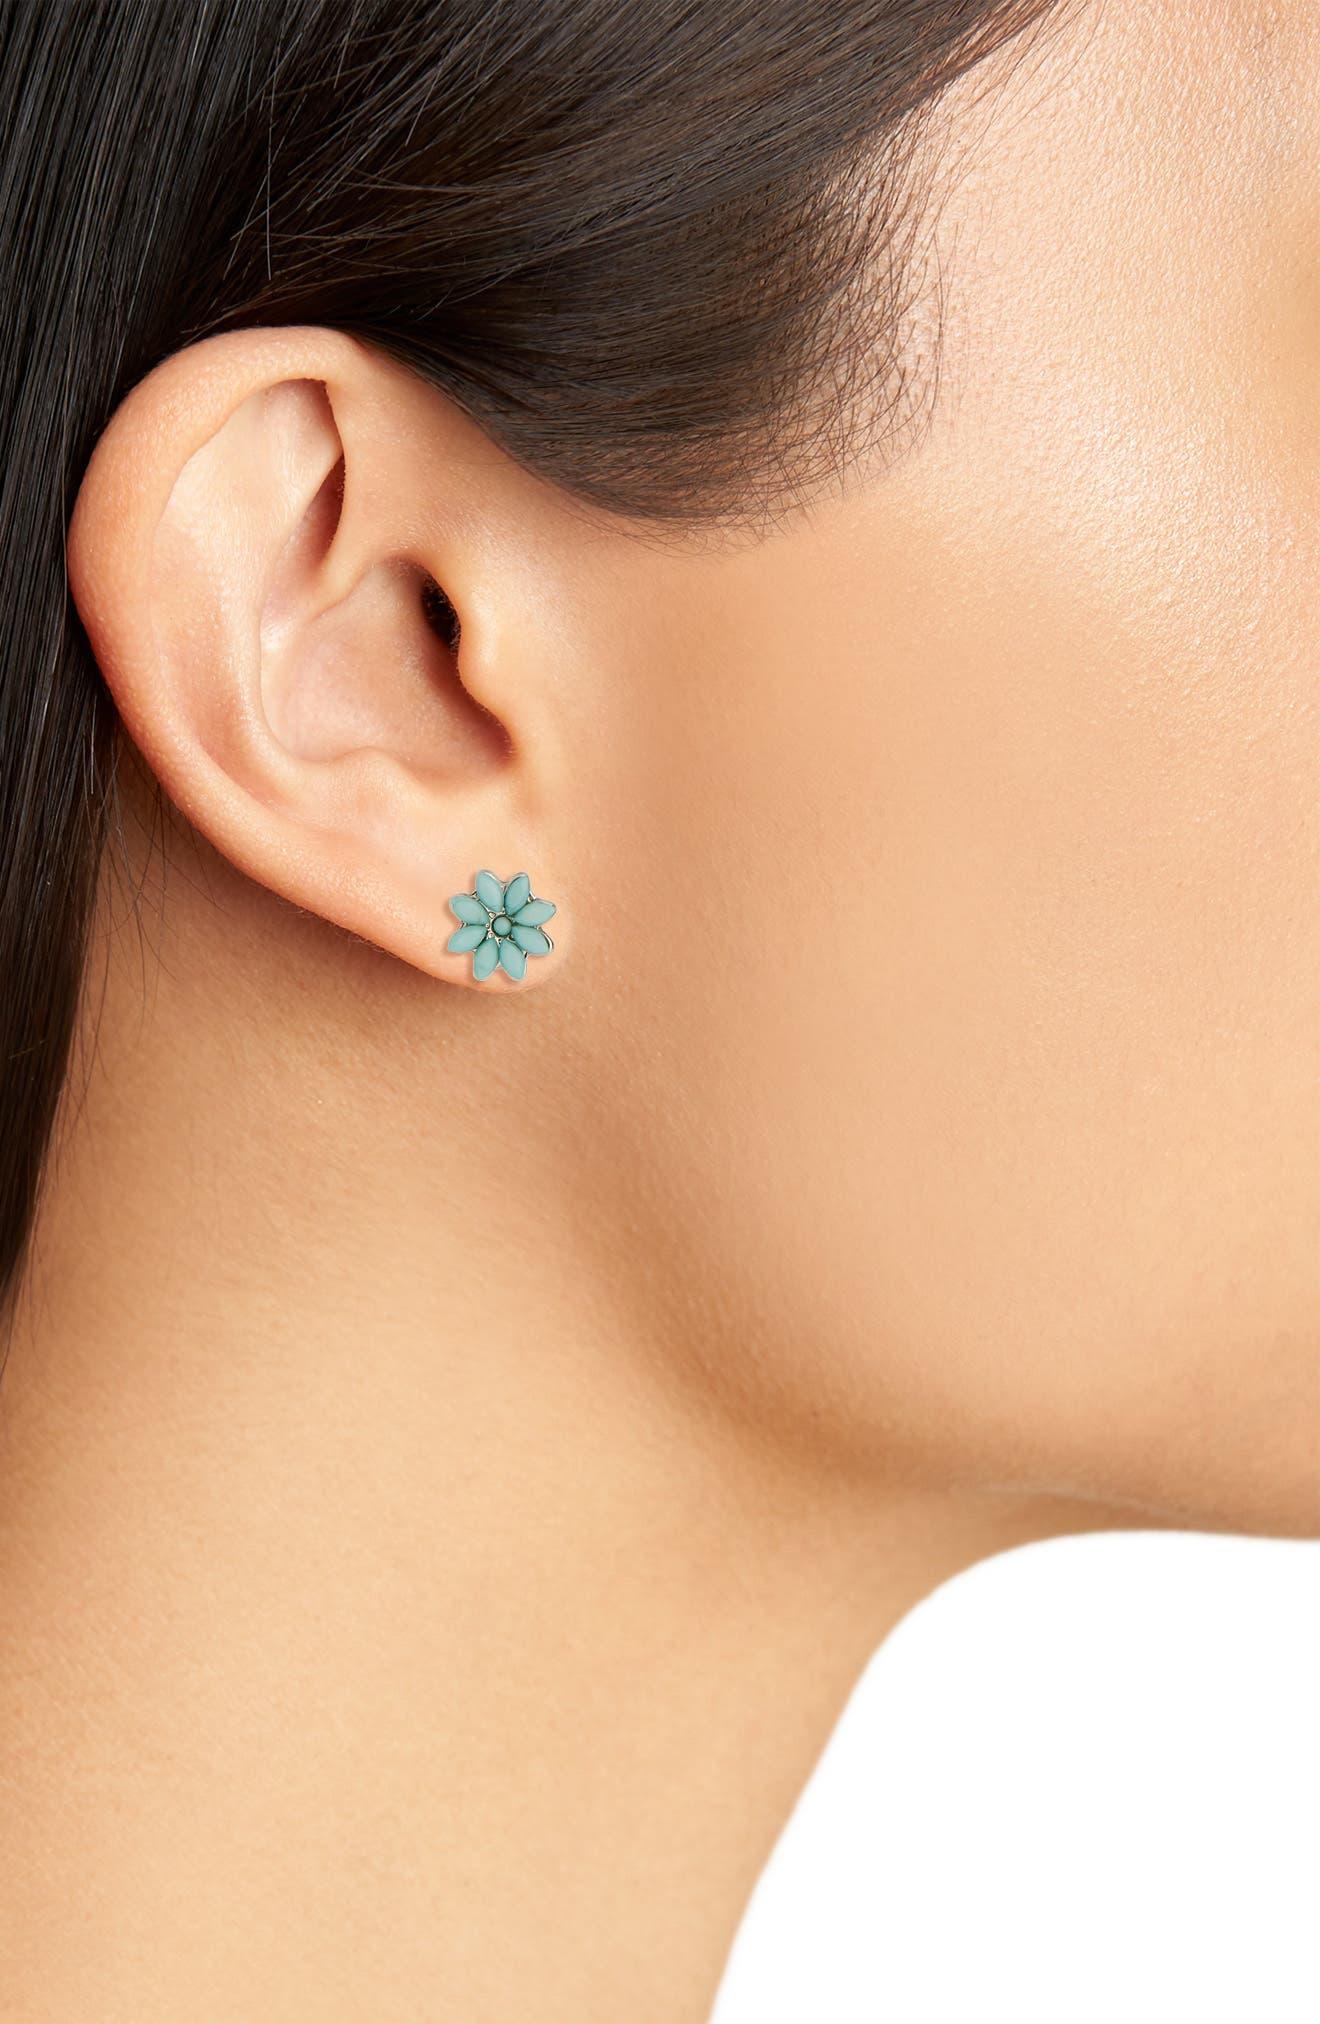 Set of 9 Butterfly Earrings,                             Alternate thumbnail 2, color,                             400